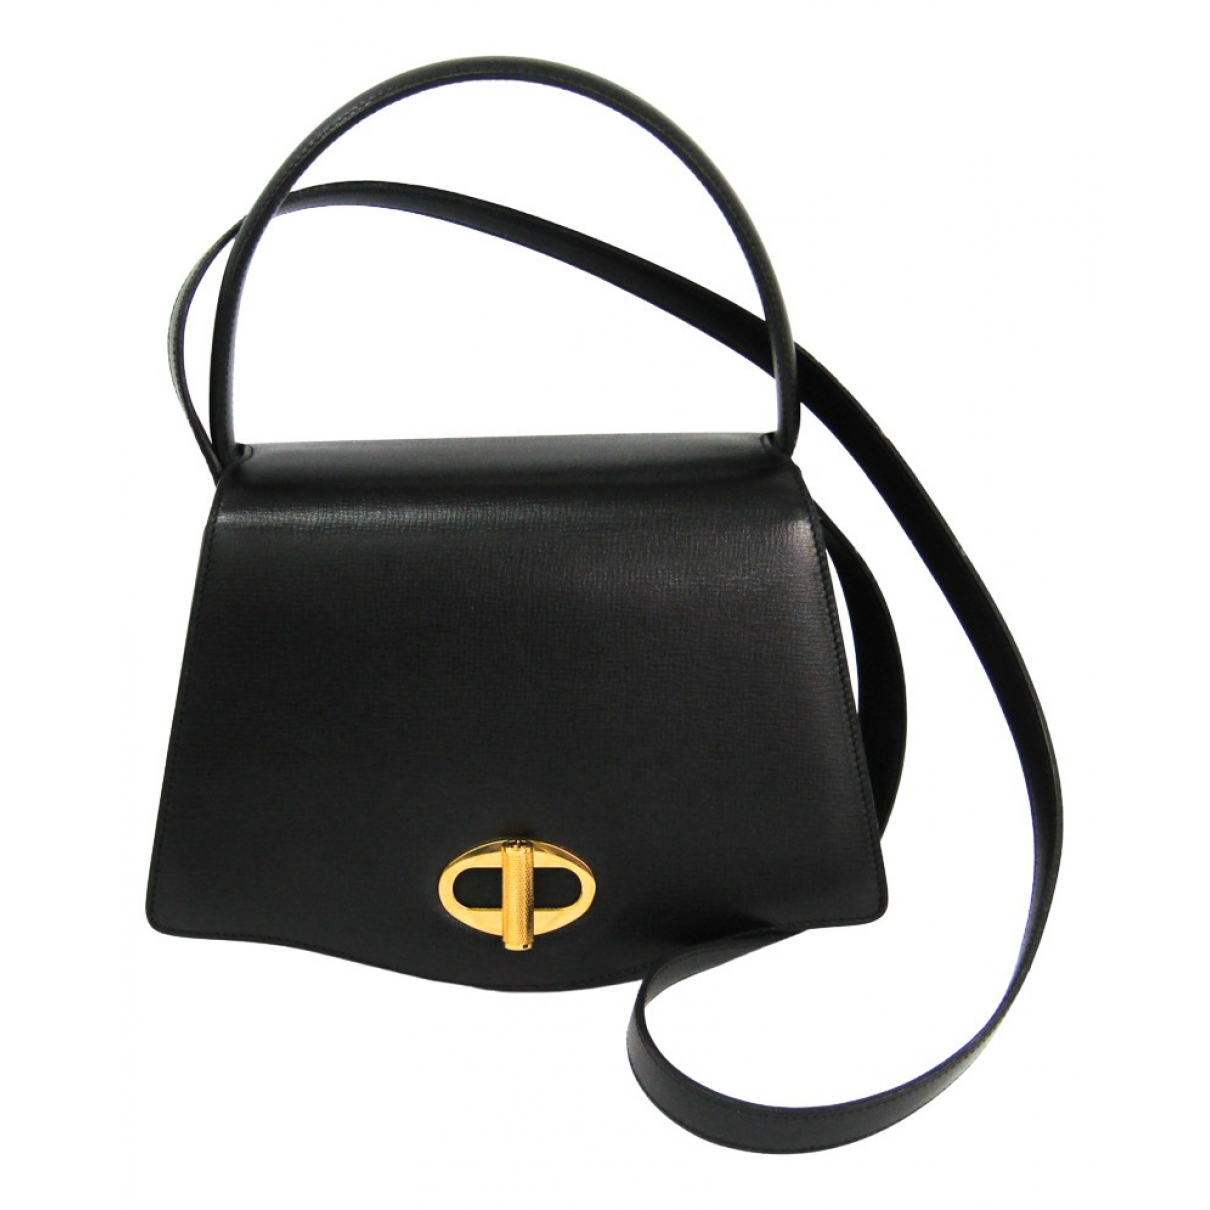 Alfred Dunhill \N Handtasche in  Schwarz Leder